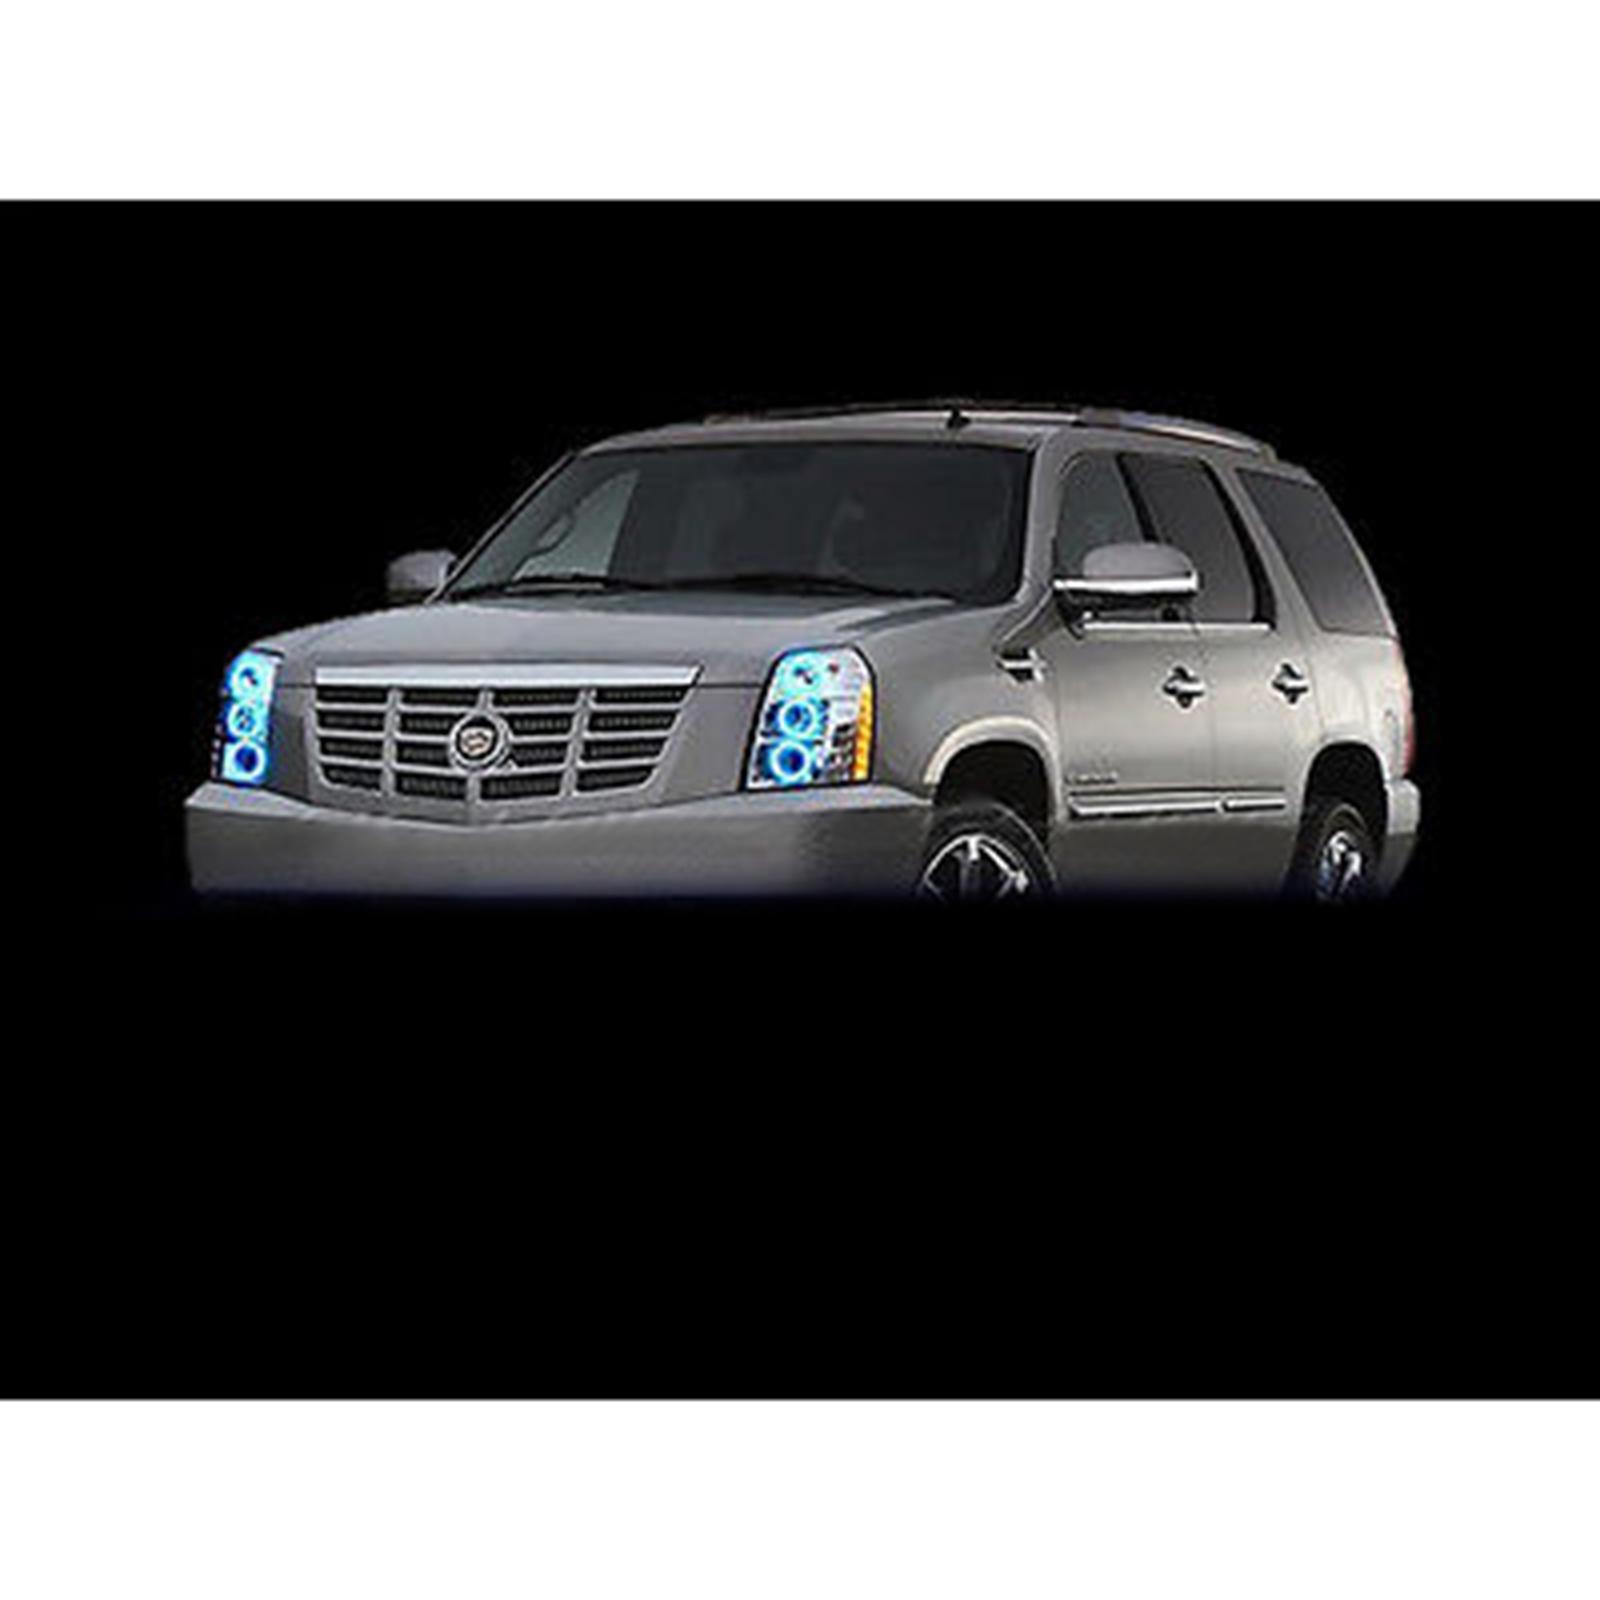 07-14 Cadillac Escalade Multi-Color Changing LED RGB ...